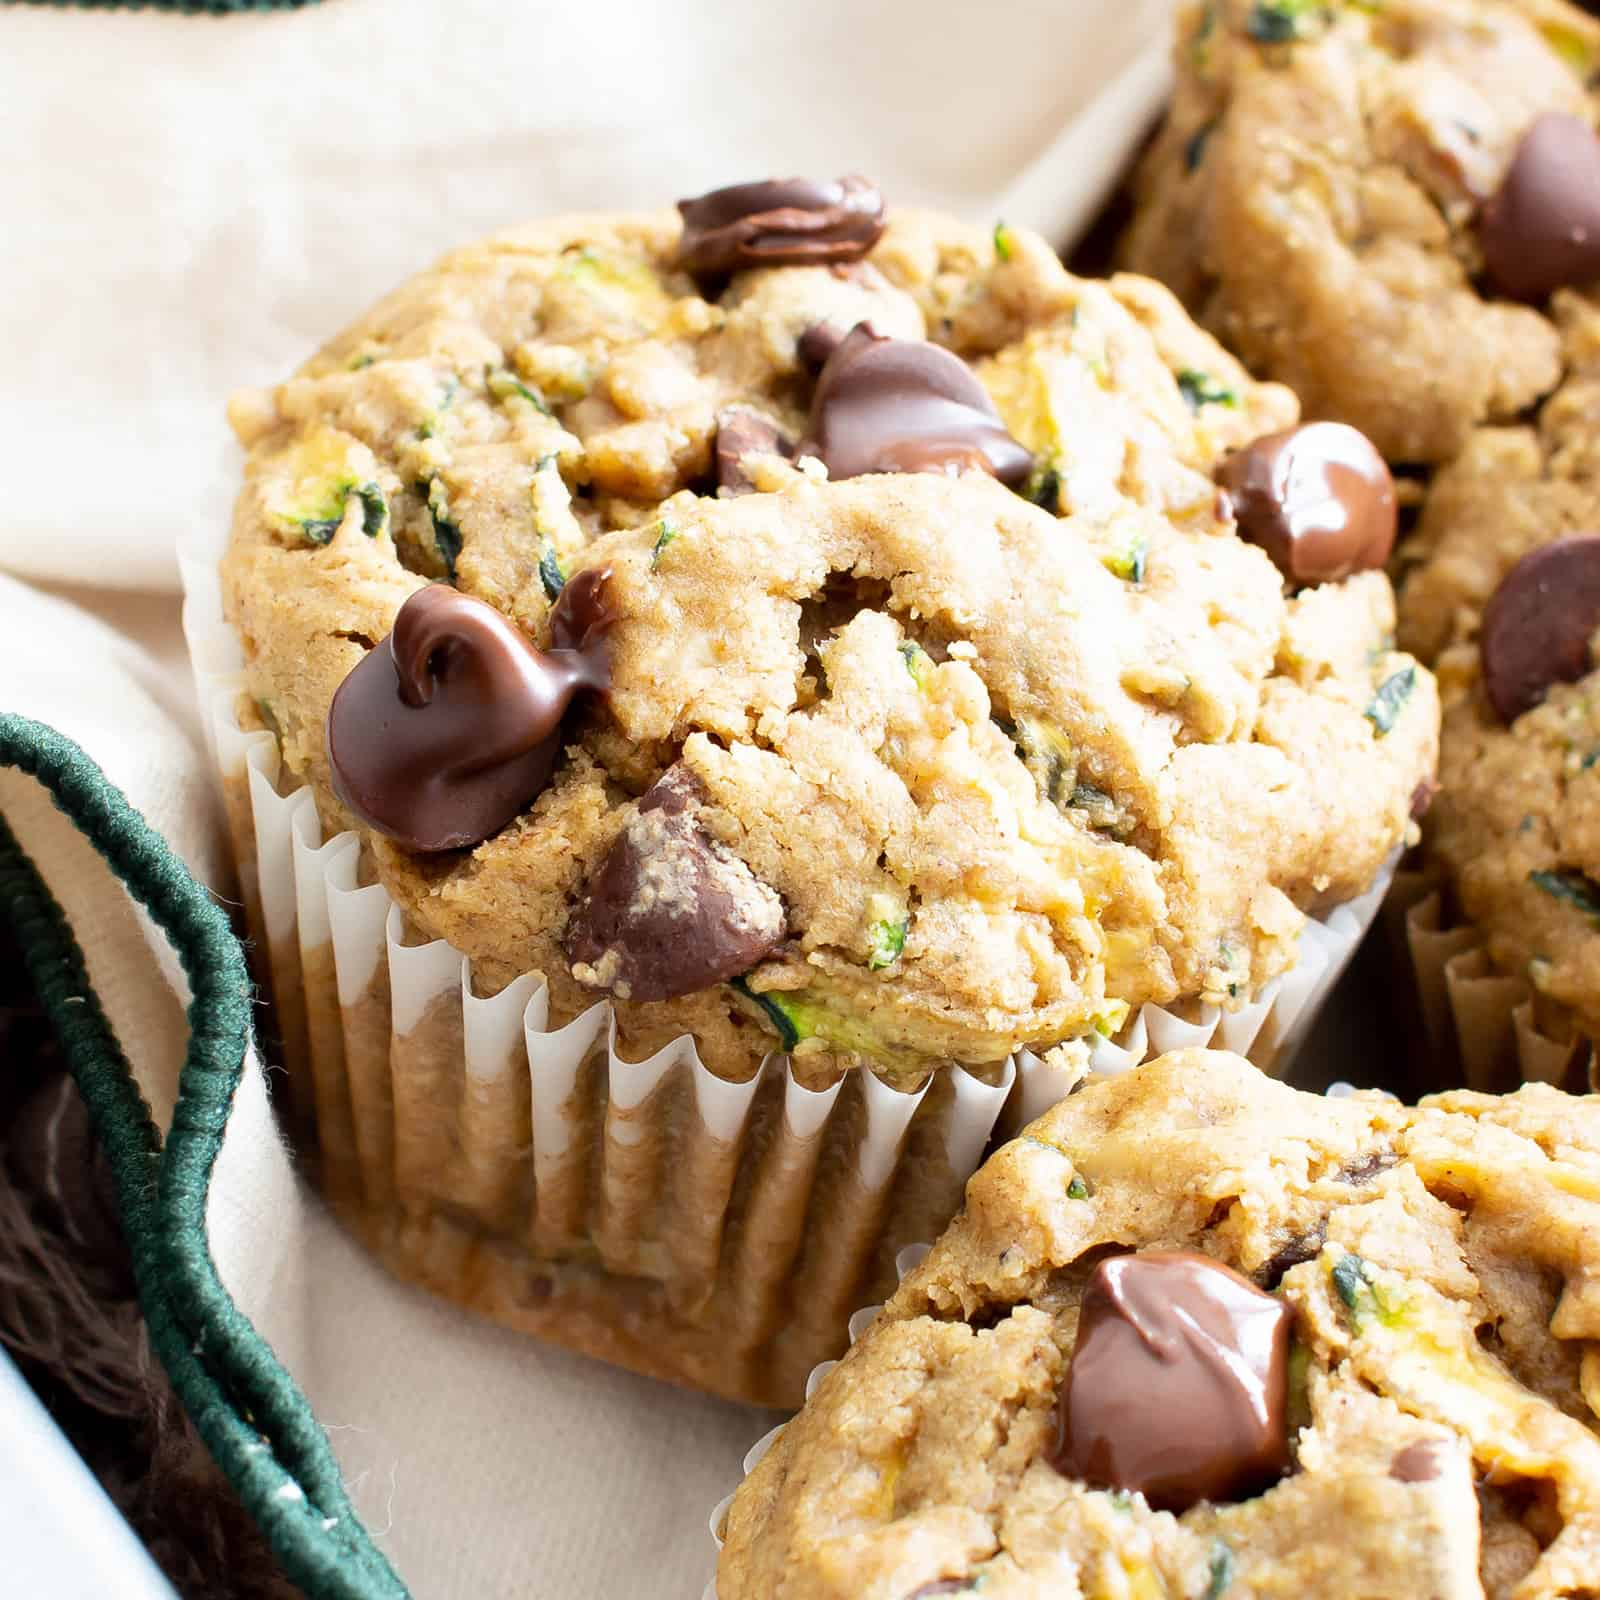 Healthy Moist Vegan Zucchini Muffins w/ Chocolate Chips (GF, V): this healthy zucchini muffins recipe is buttery, moist & fluffy! The best gluten free vegan zucchini muffins—egg free, easy & packed with chocolate! #Zucchini #Muffins #Vegan #GlutenFree #Healthy   Recipe at BeamingBaker.com